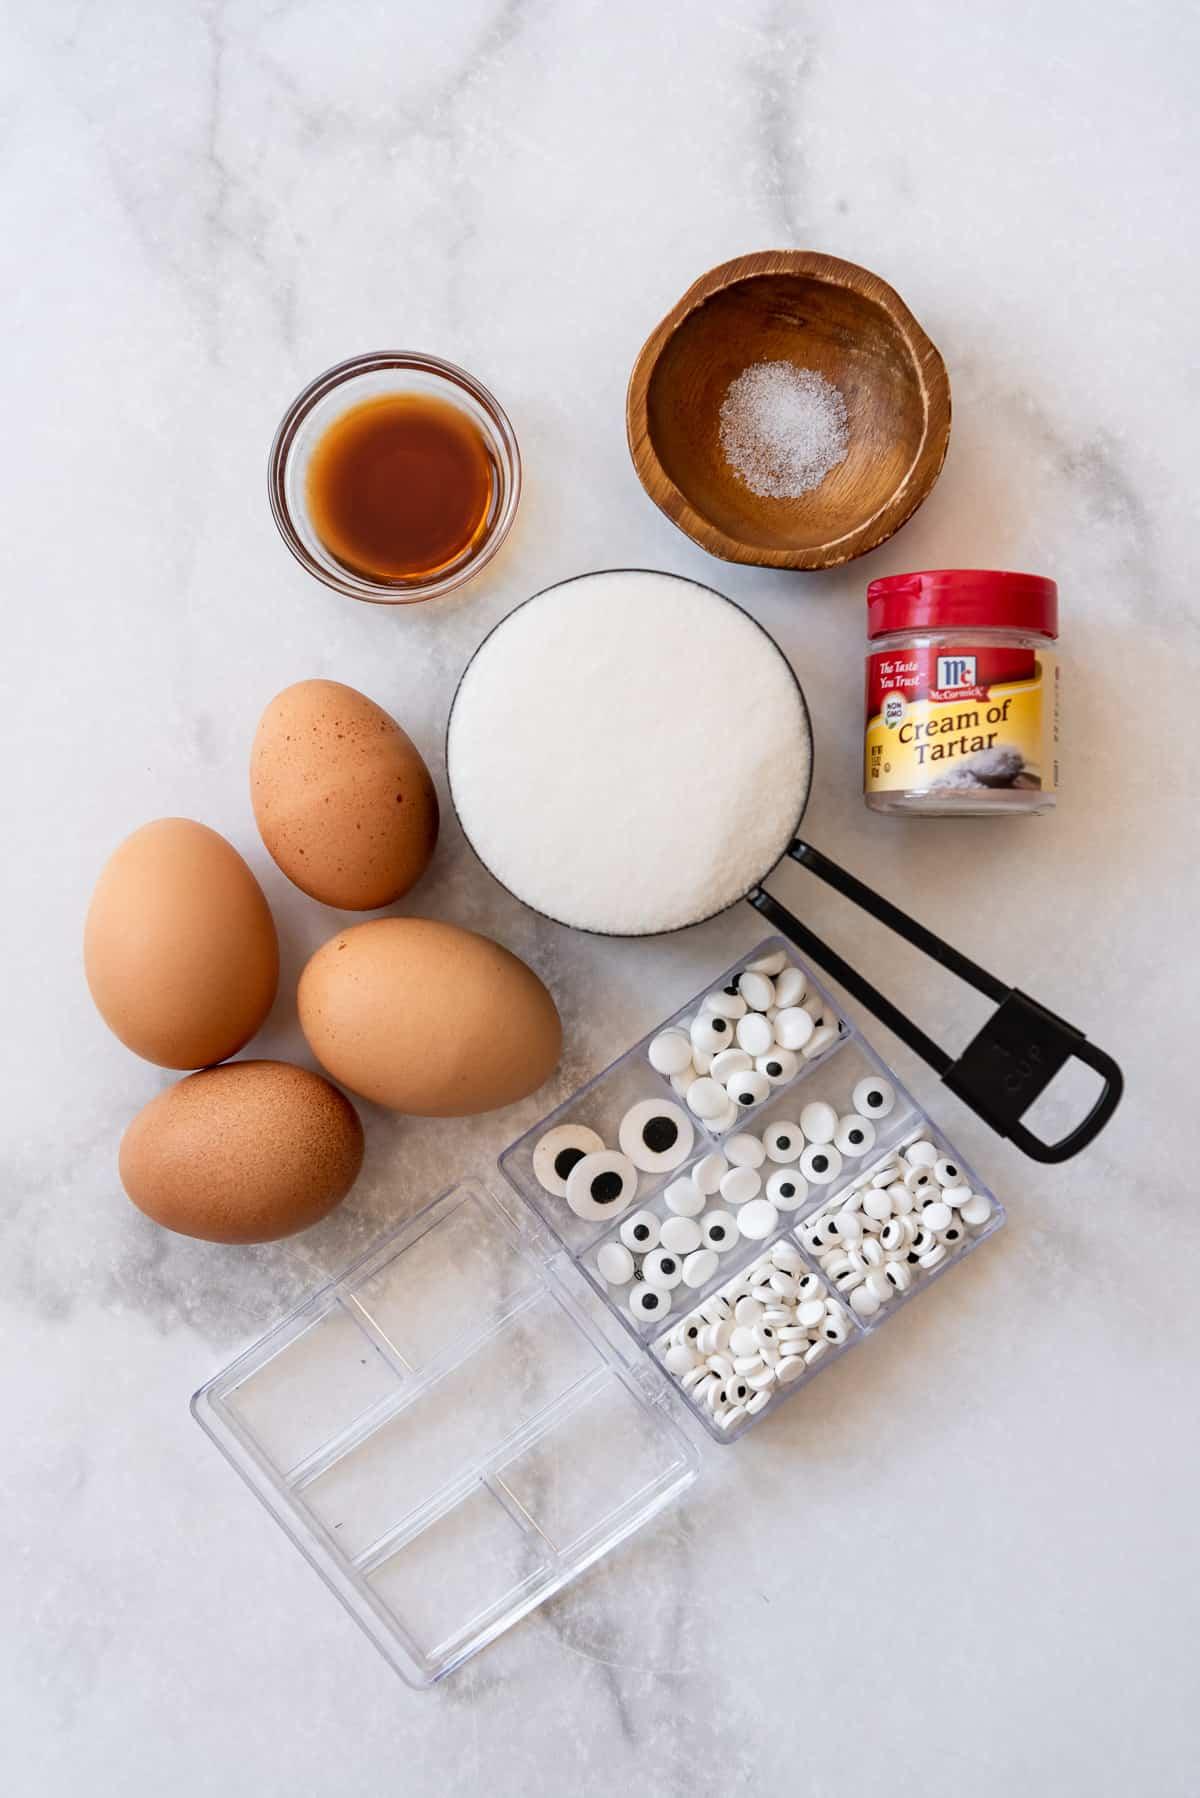 Ingredients for making meringue cookies for Halloween.